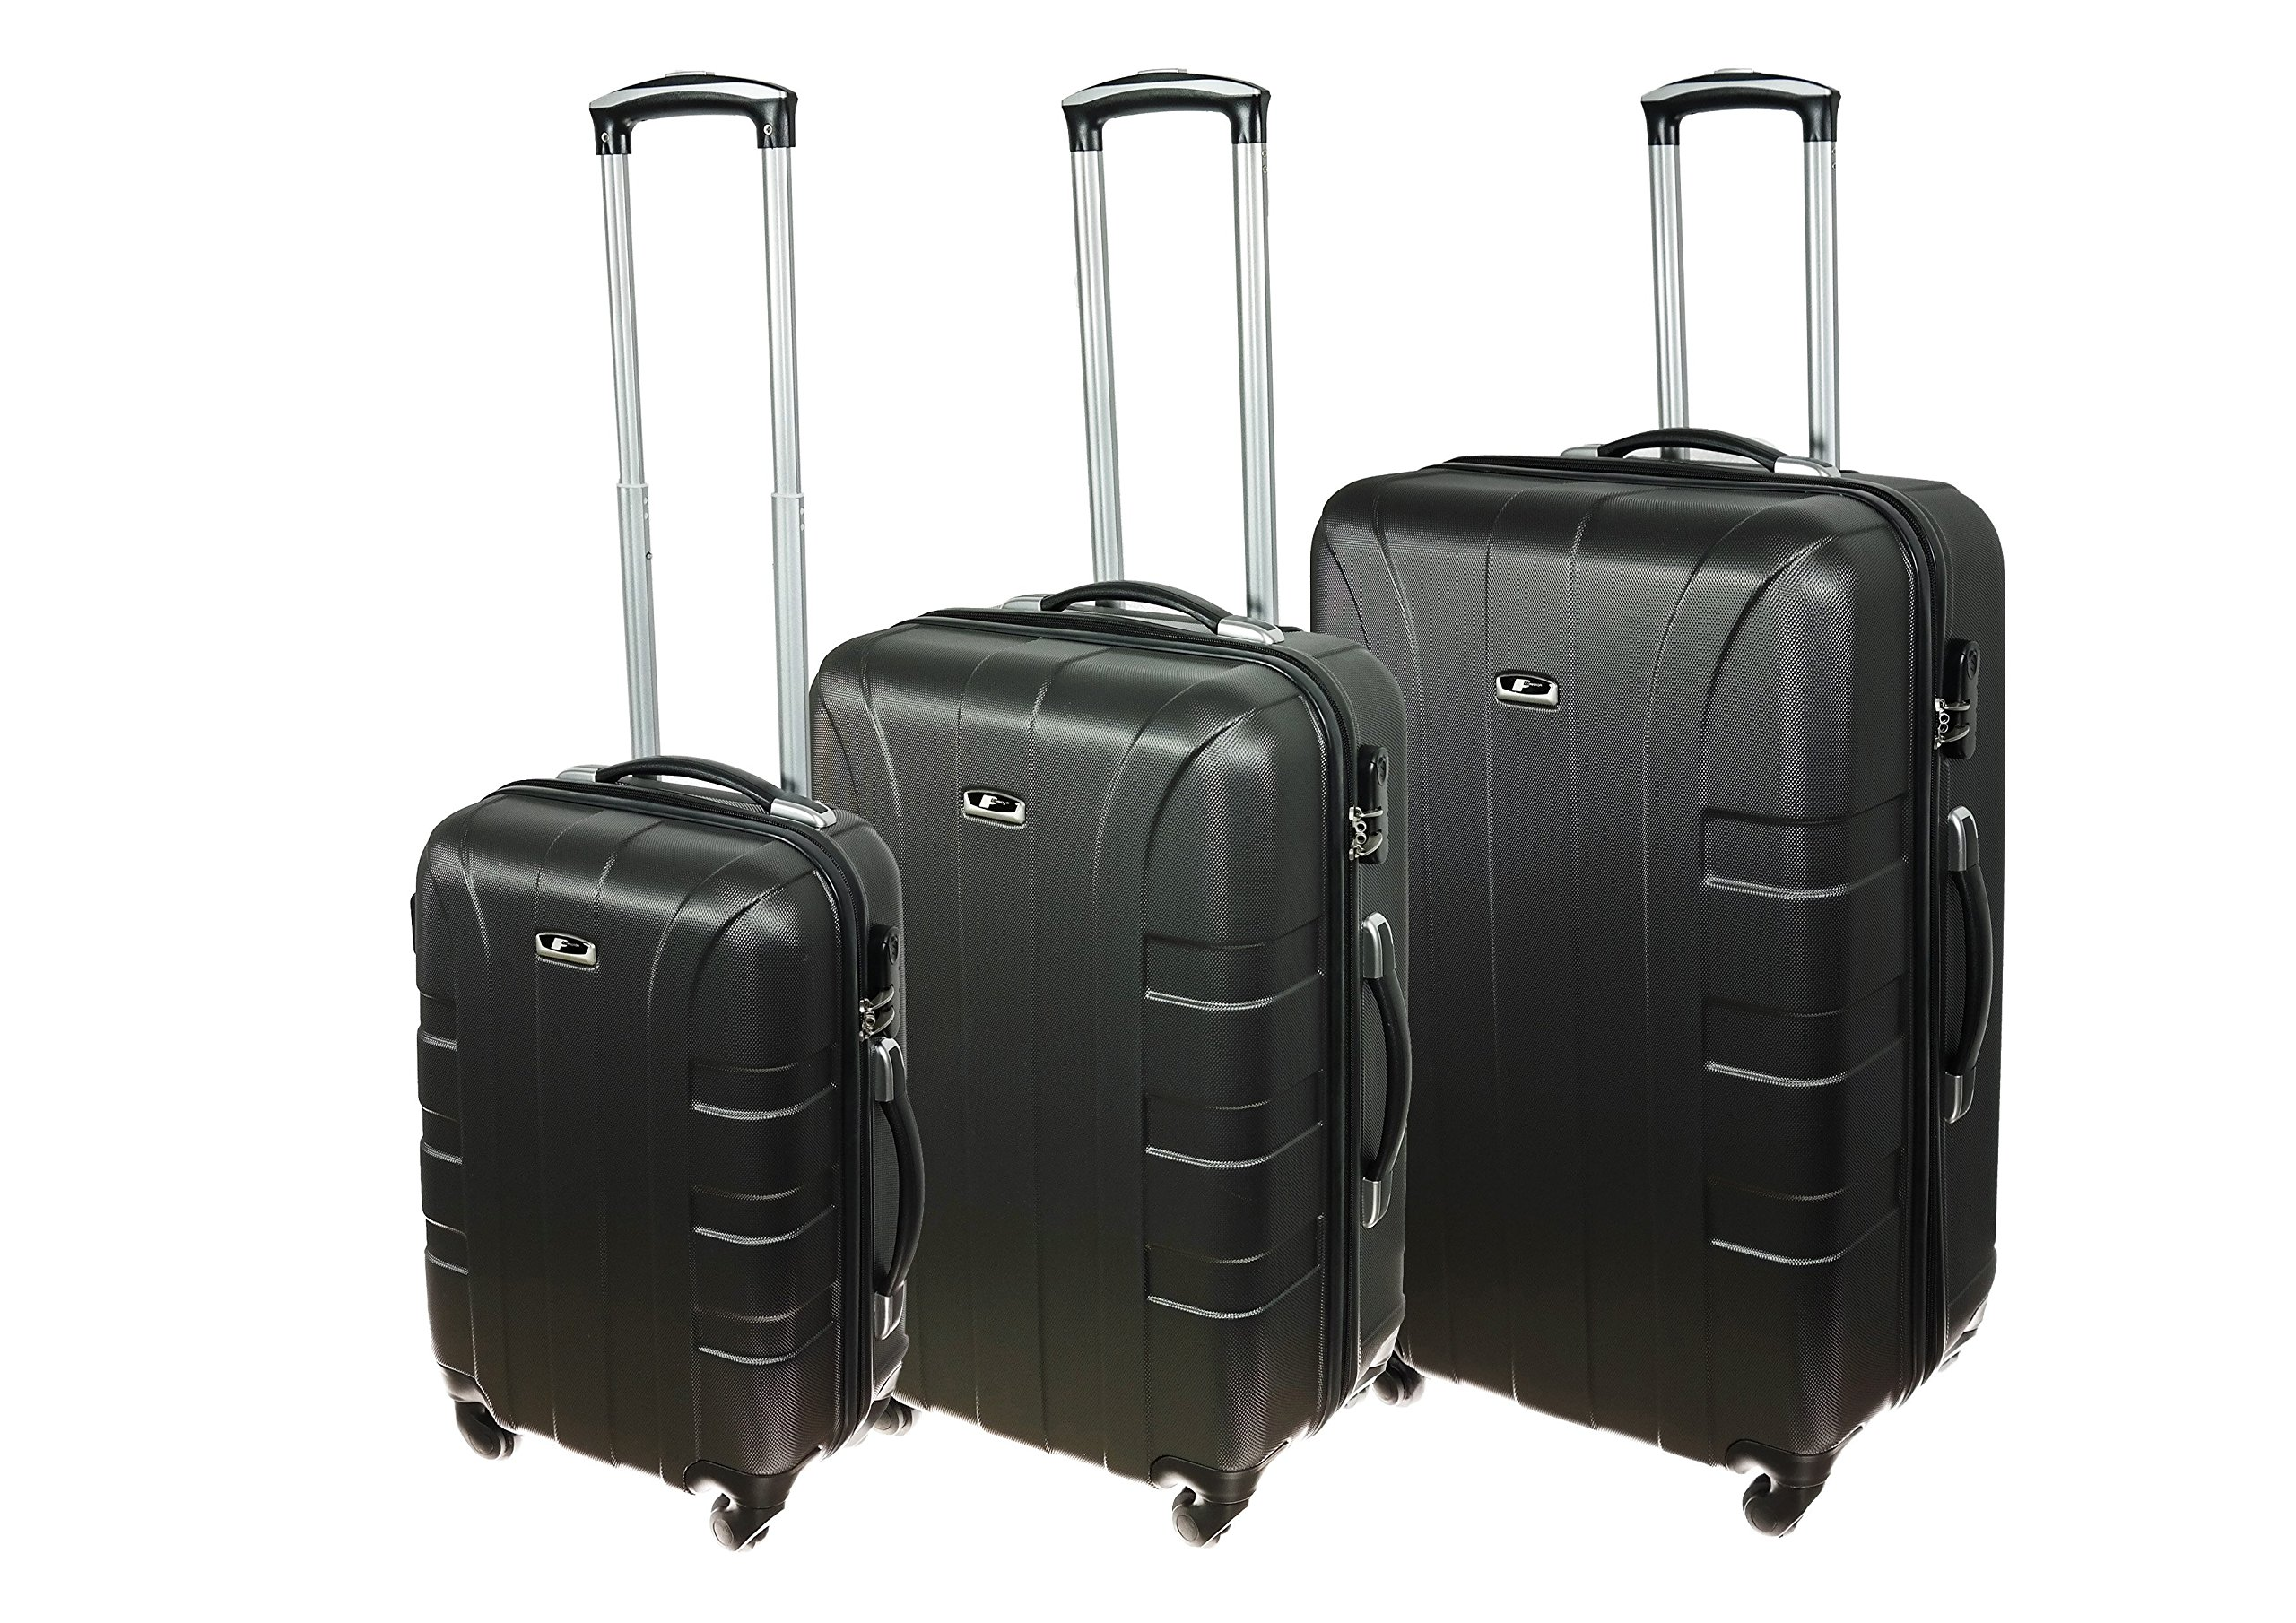 P-Collection-Hartschalen-Kofferset-Trolley-Koffer-Reisekoffer